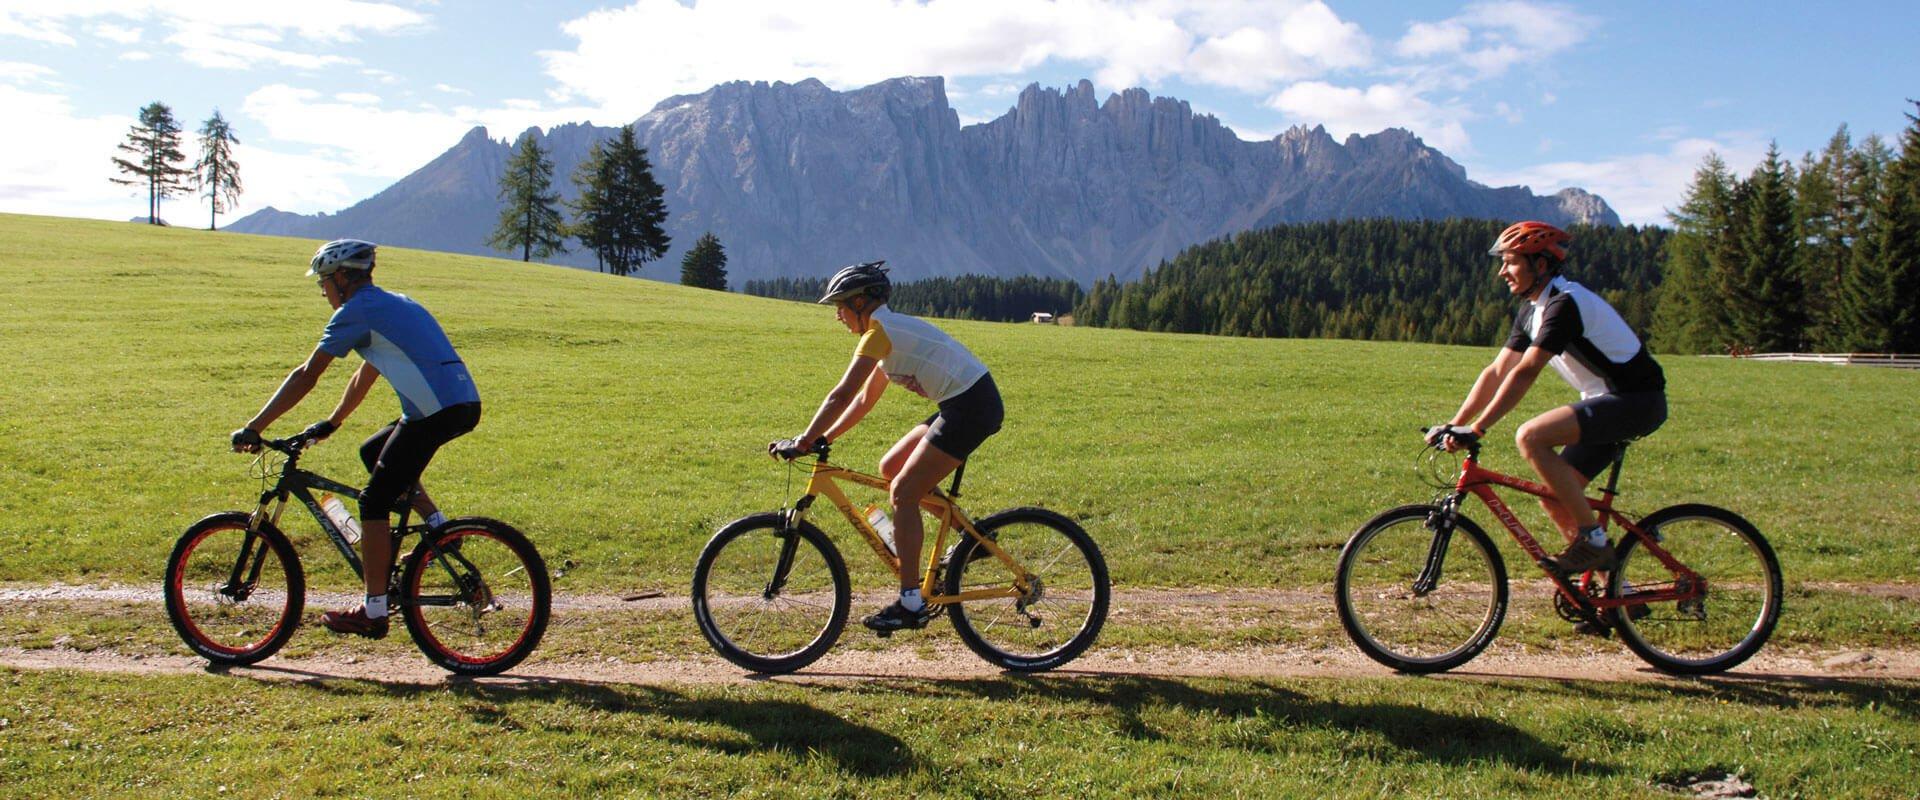 aktivurlaub-mountainbike-eisacktal